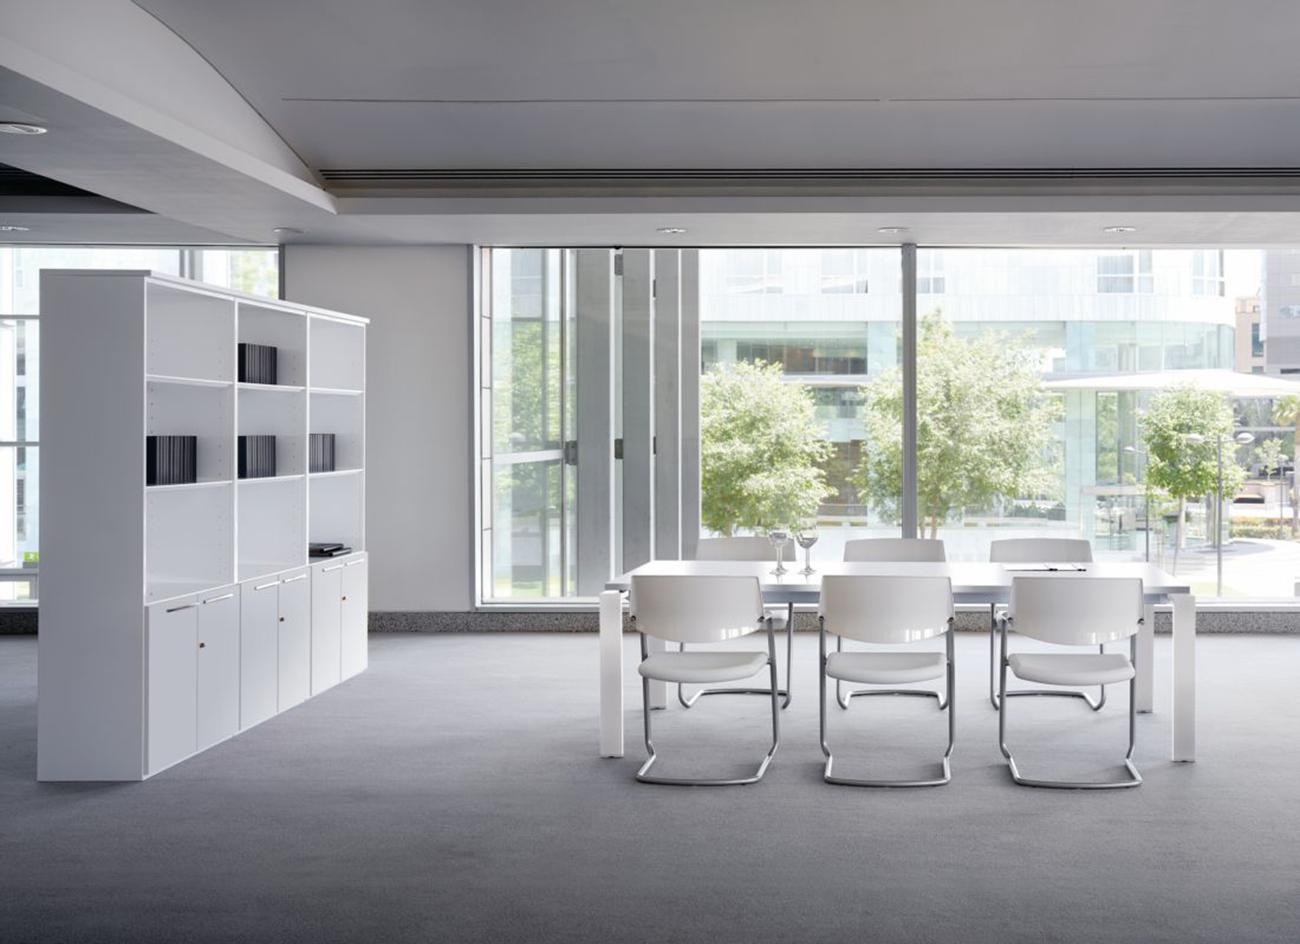 Muebles de oficina wizzy obtenga ideas dise o de muebles for Muebles de oficina wizzy